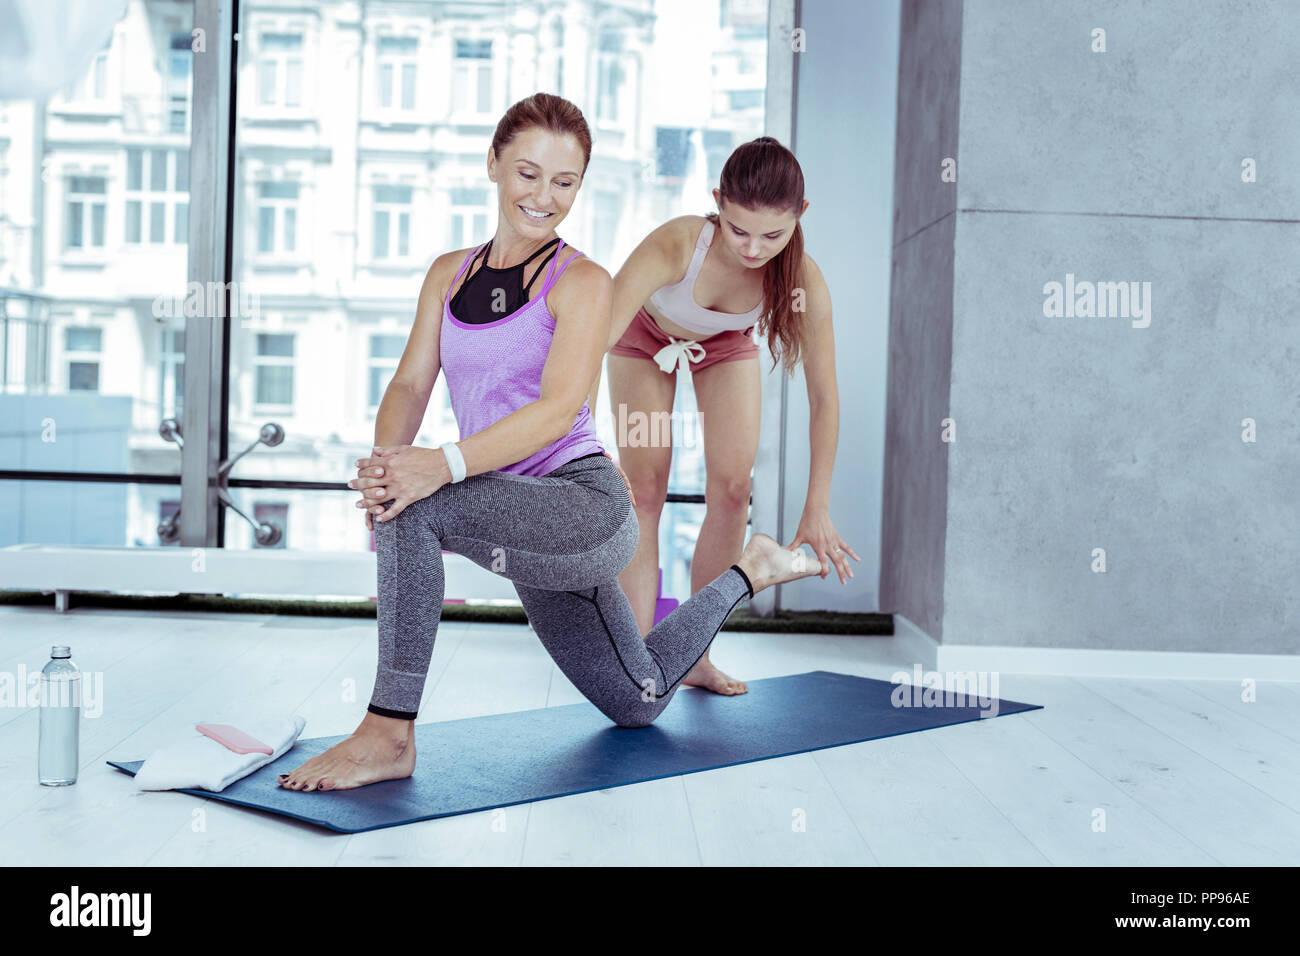 Optimistisch reife frau yoga mit Trainer Stockbild